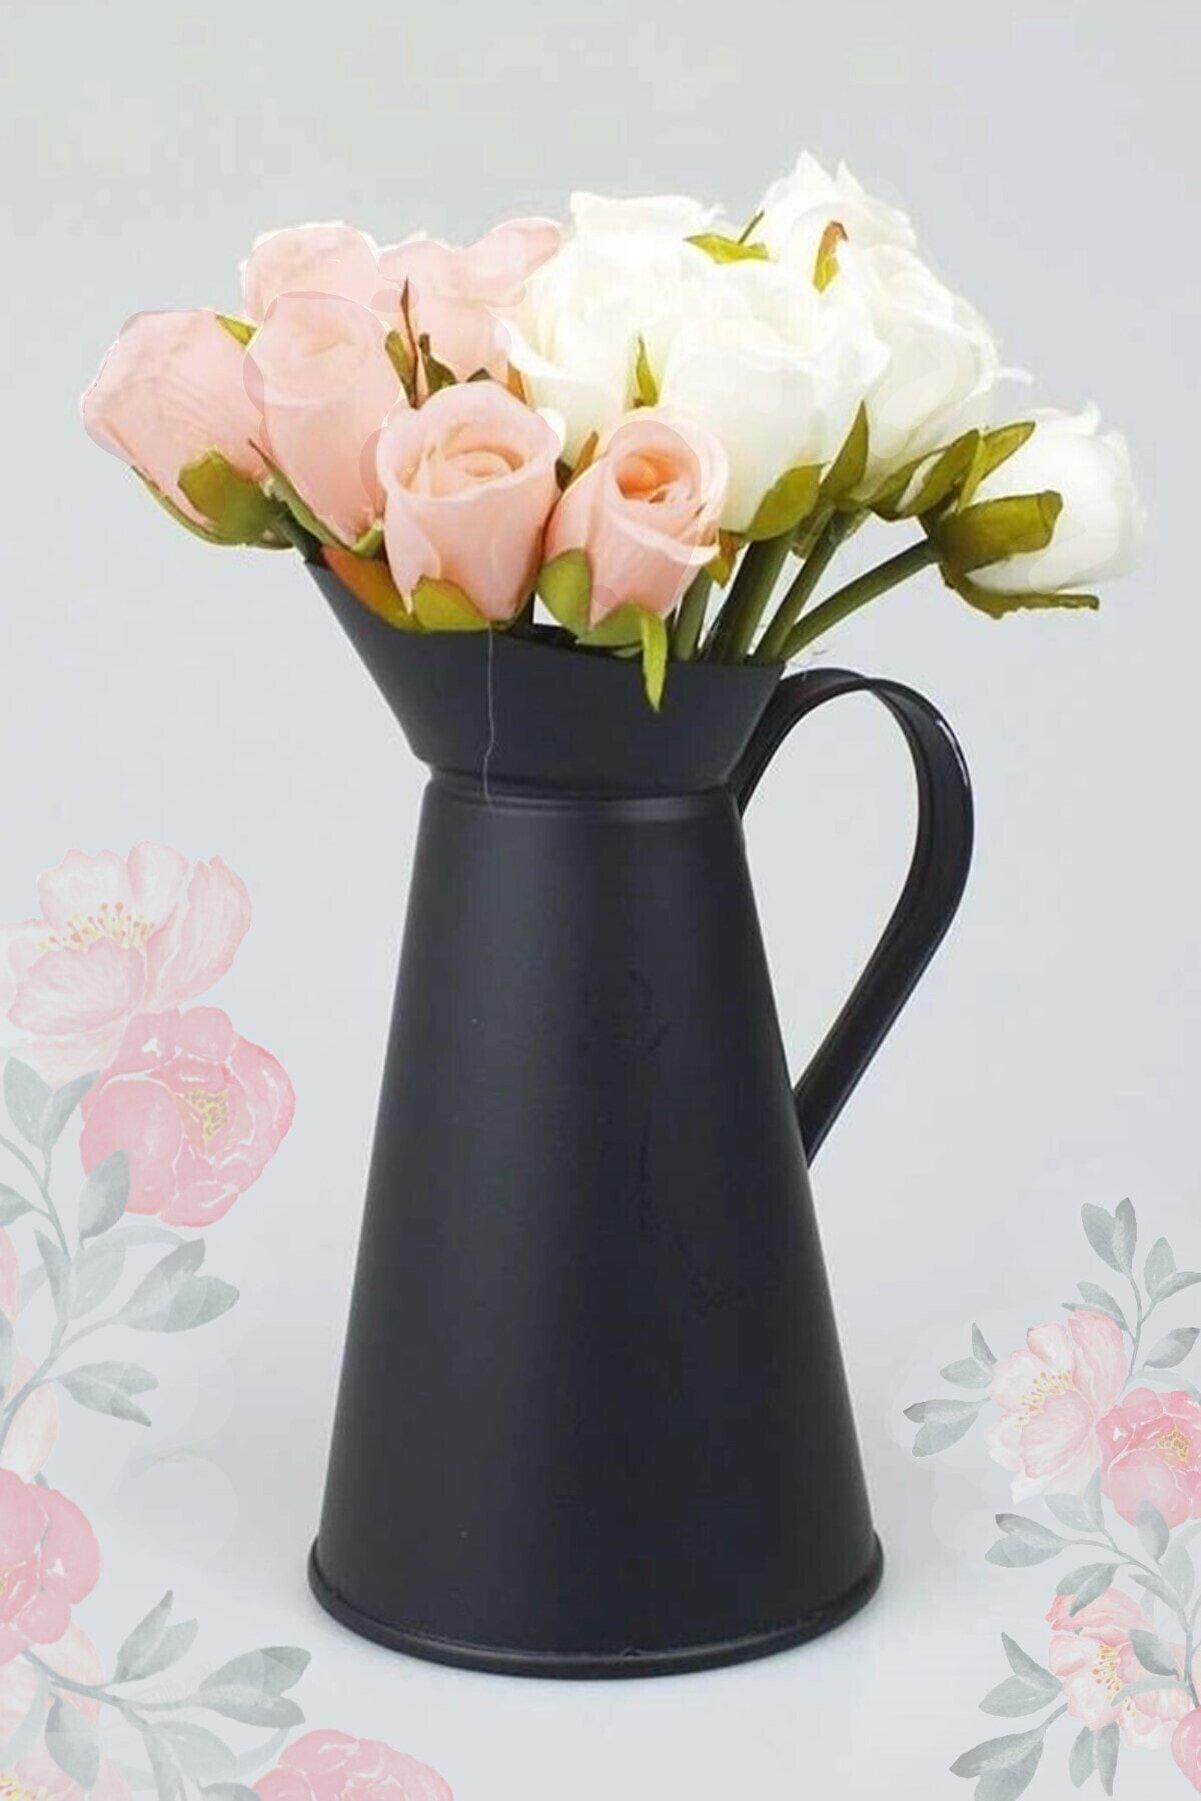 Kitchen Life Özel Tasarım Metal Italyan Vazo